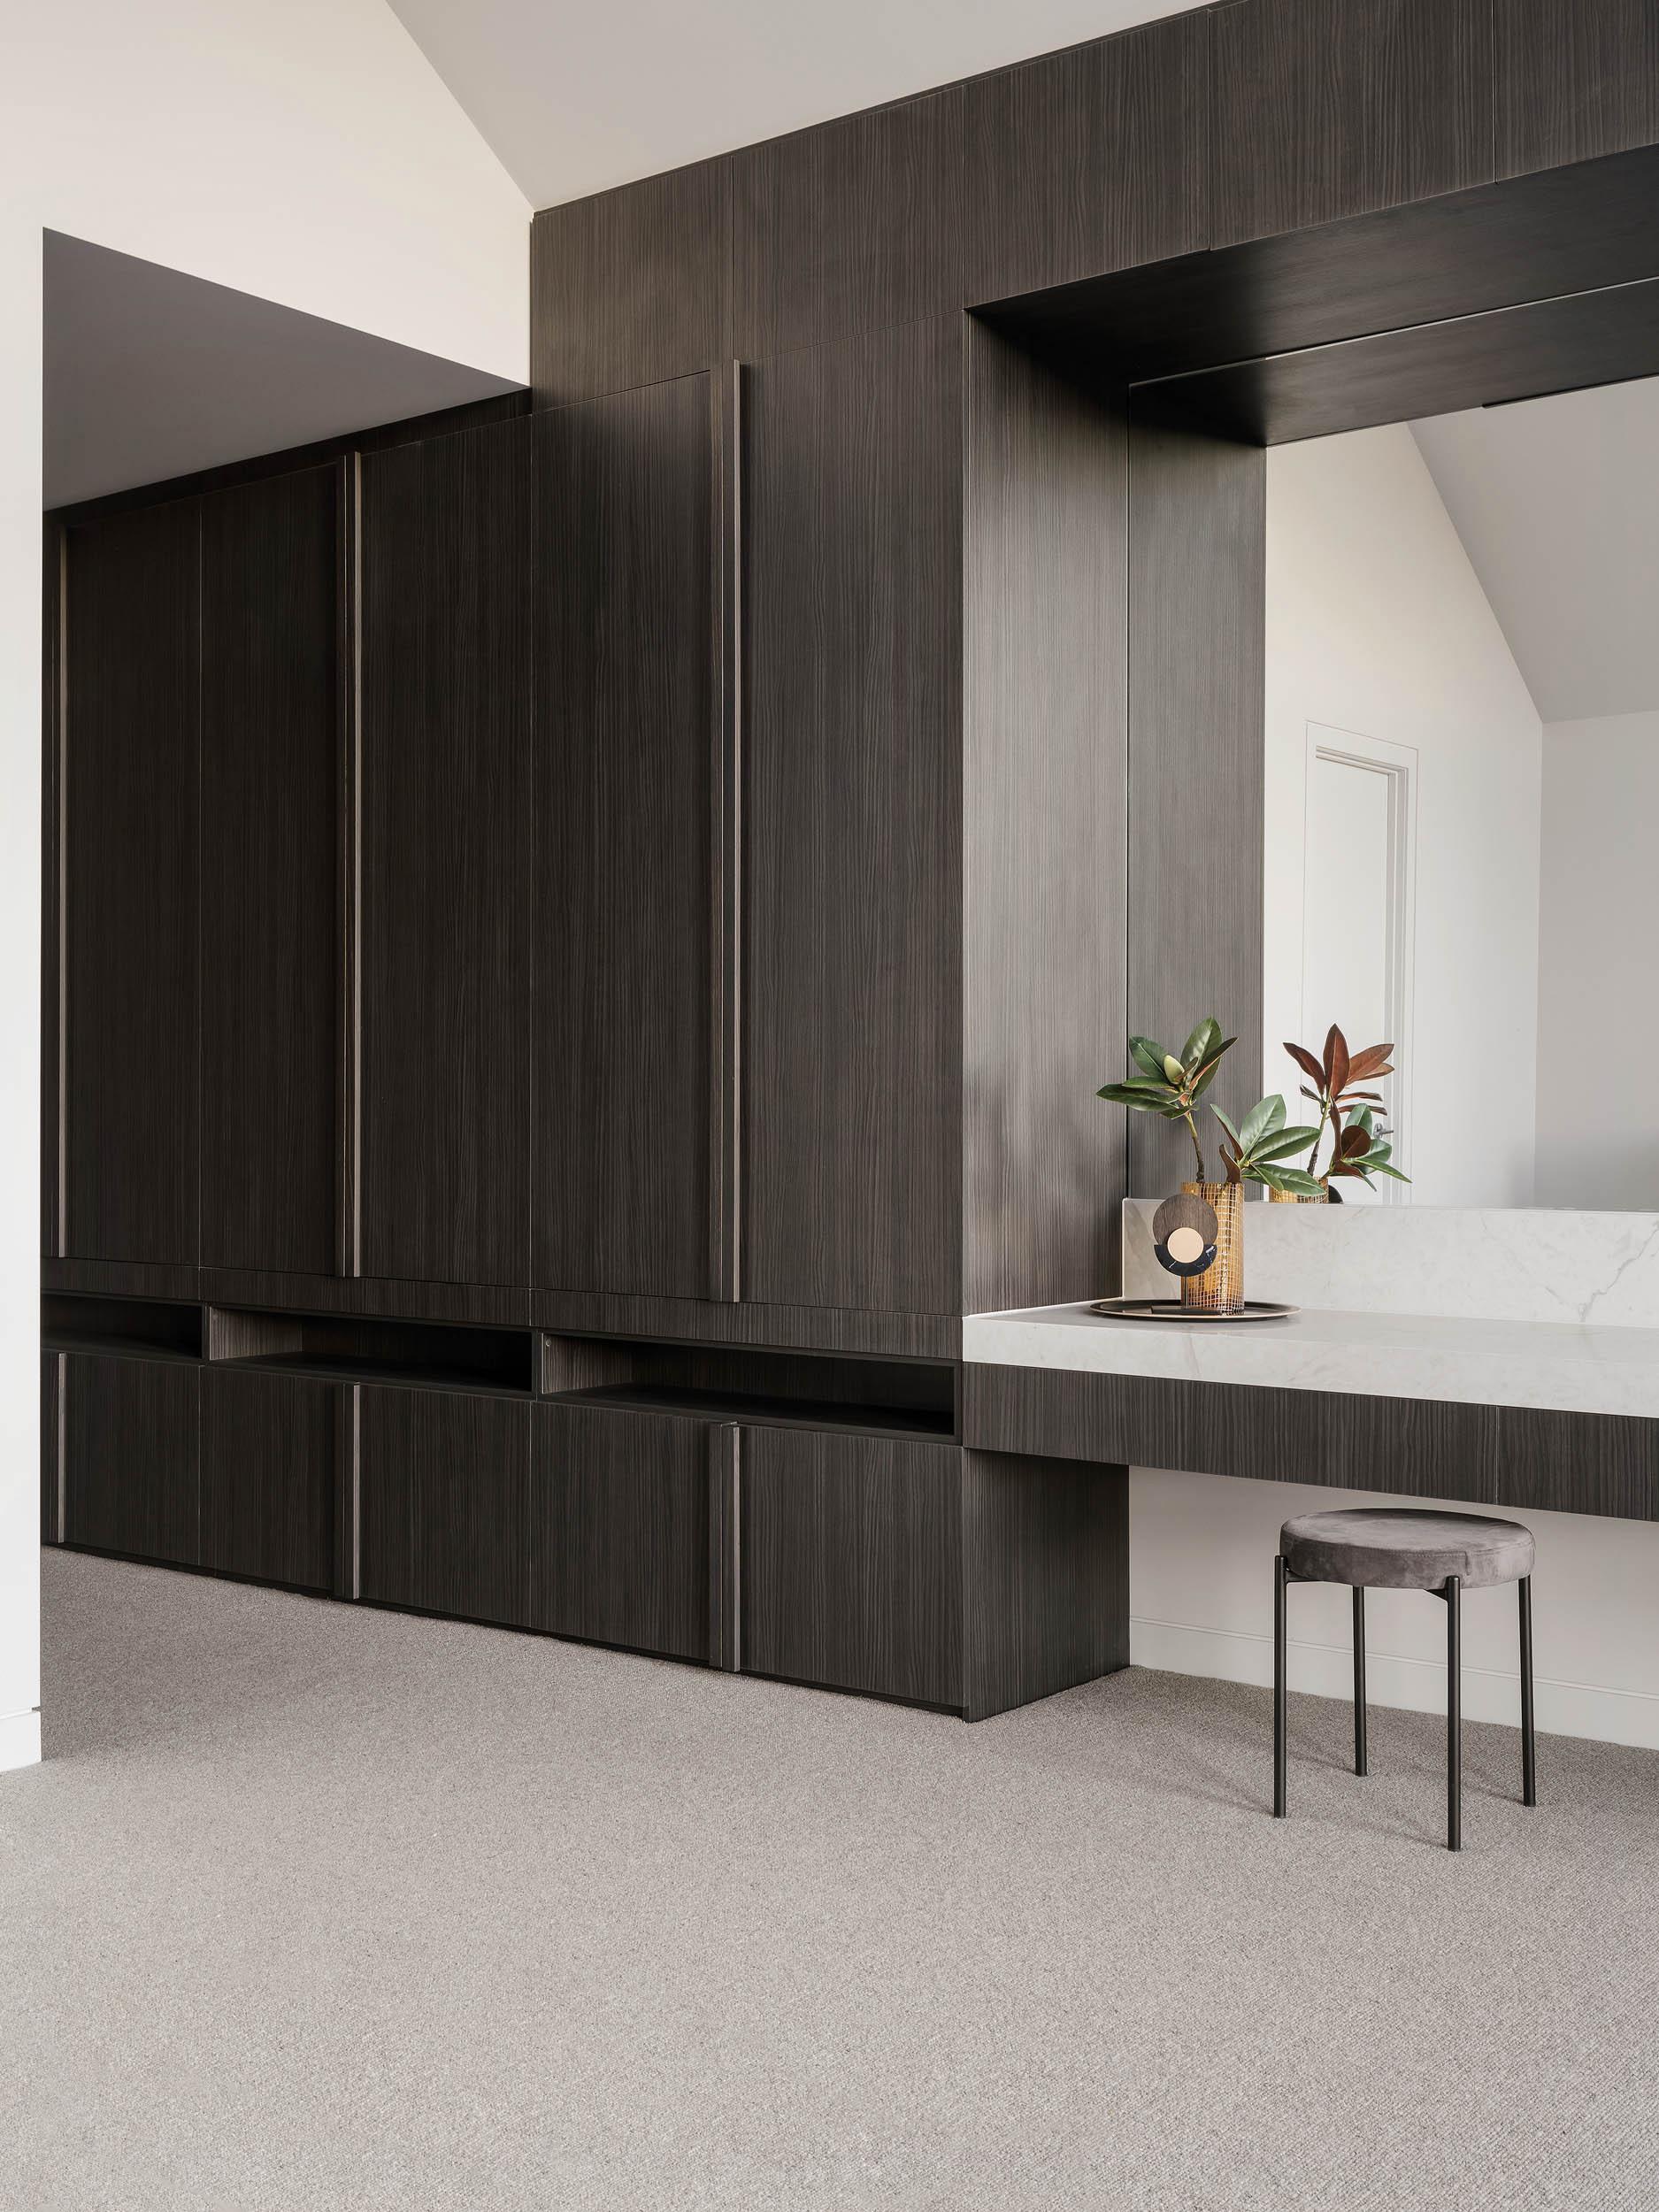 c.kairouz architects fairfield townhouse architectural interior cabinetry